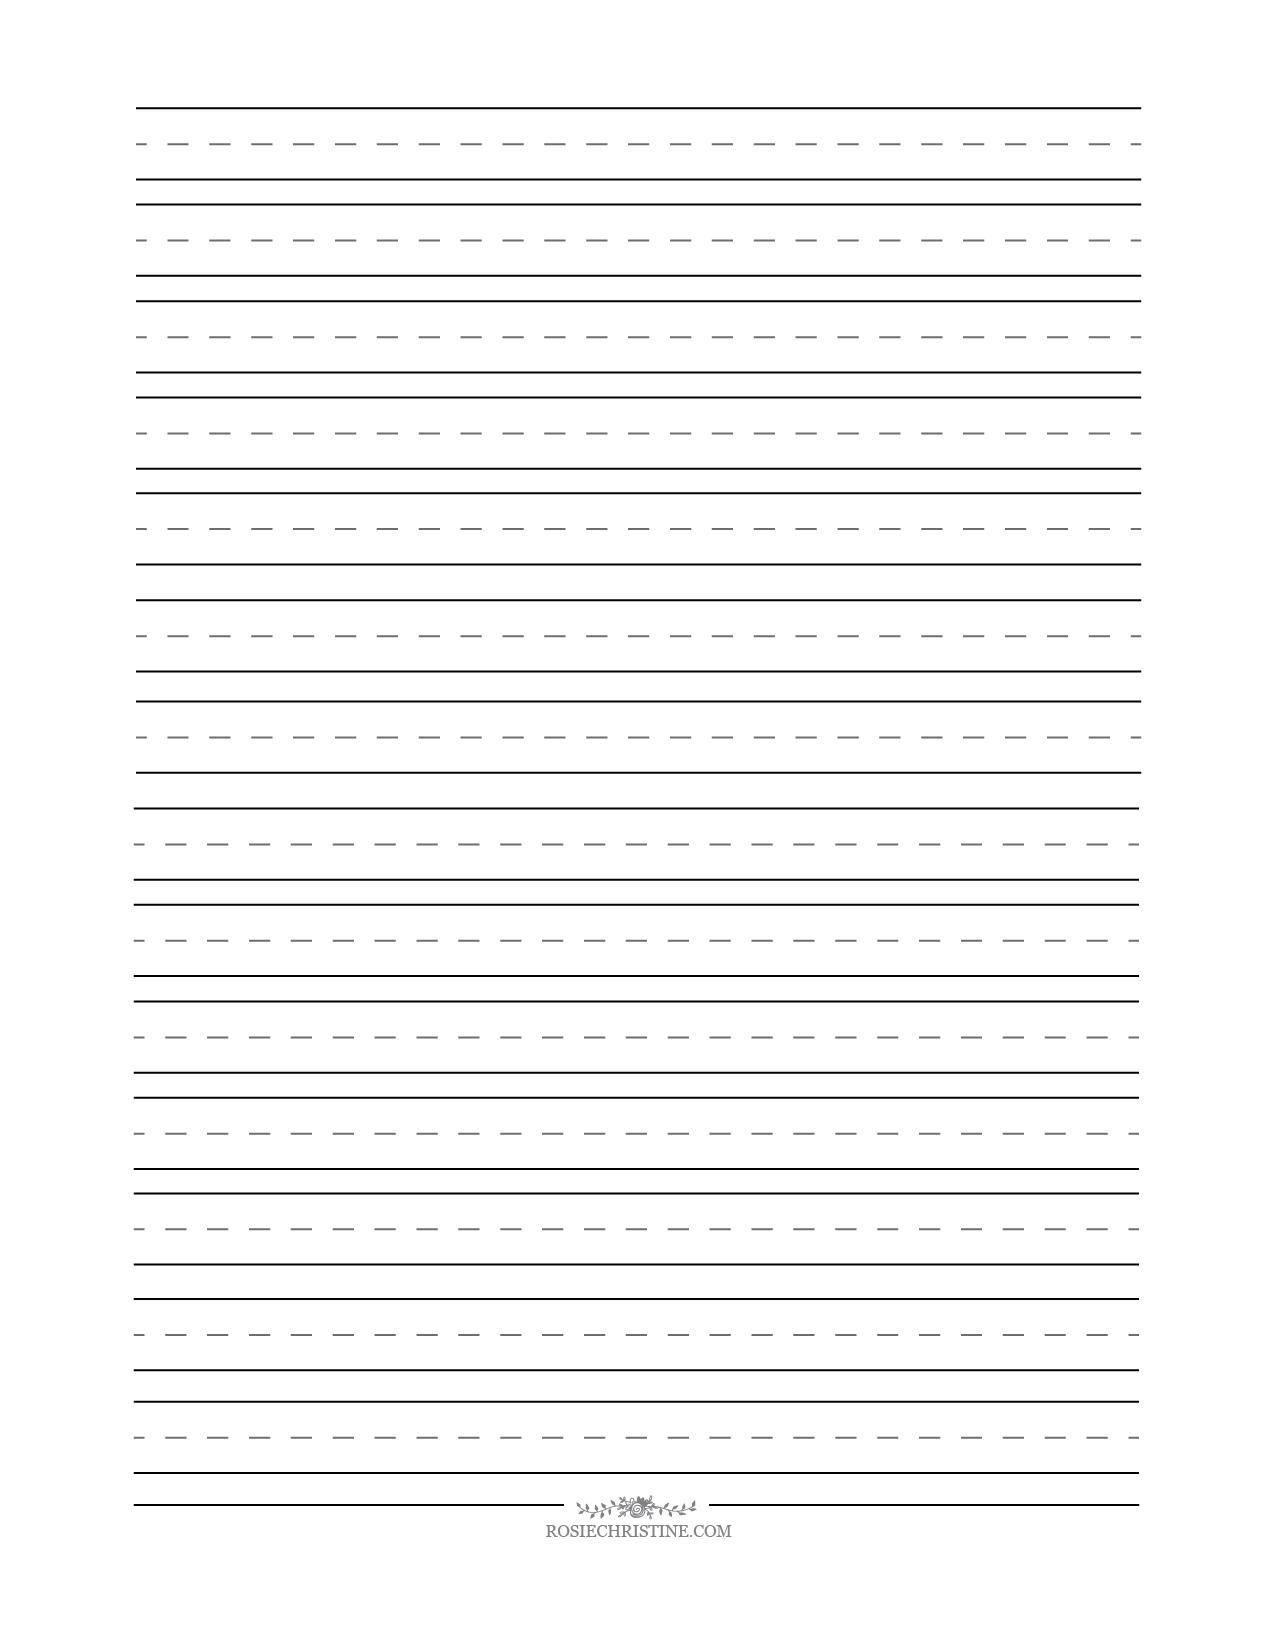 Cursive Blank Worksheets Rosie Christine